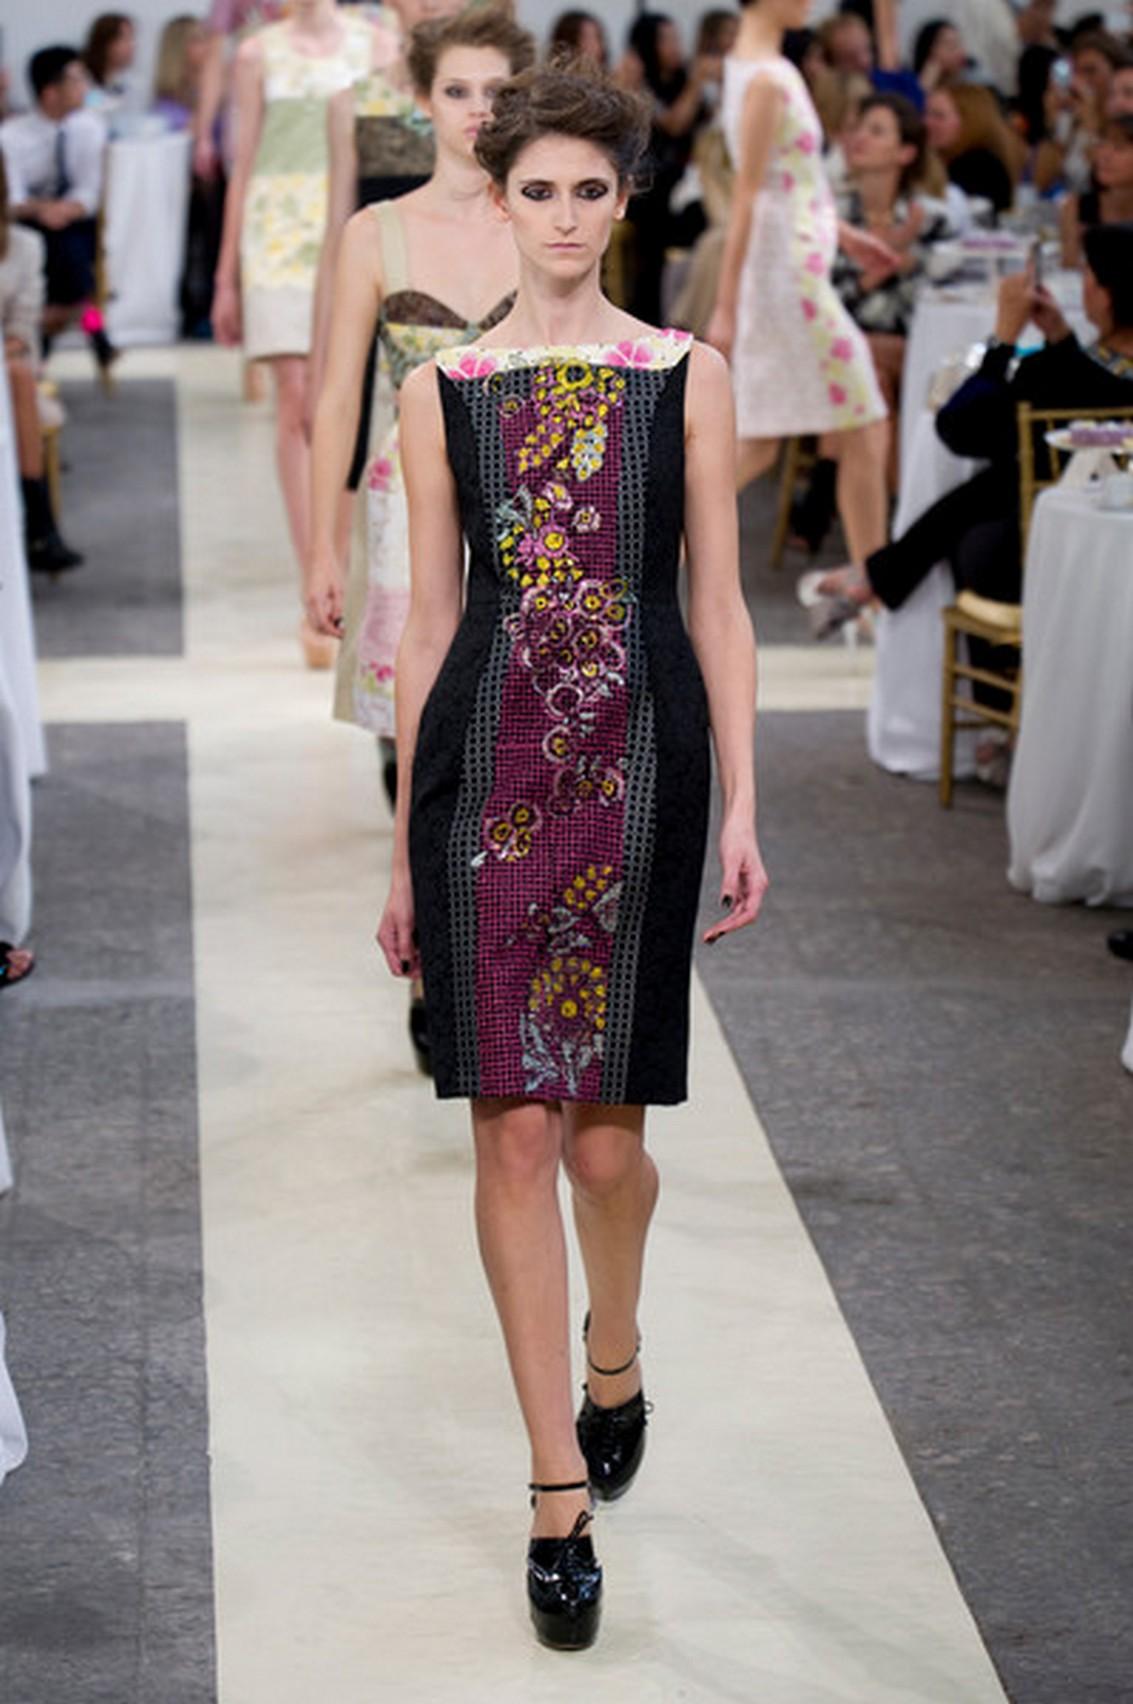 Antonio Marras 2014 milan fashion week Day 3 and 4 Highlights, Milan Fashion Week, Spring Summer 2014 Antonio Marras Spring Summer 2014 2